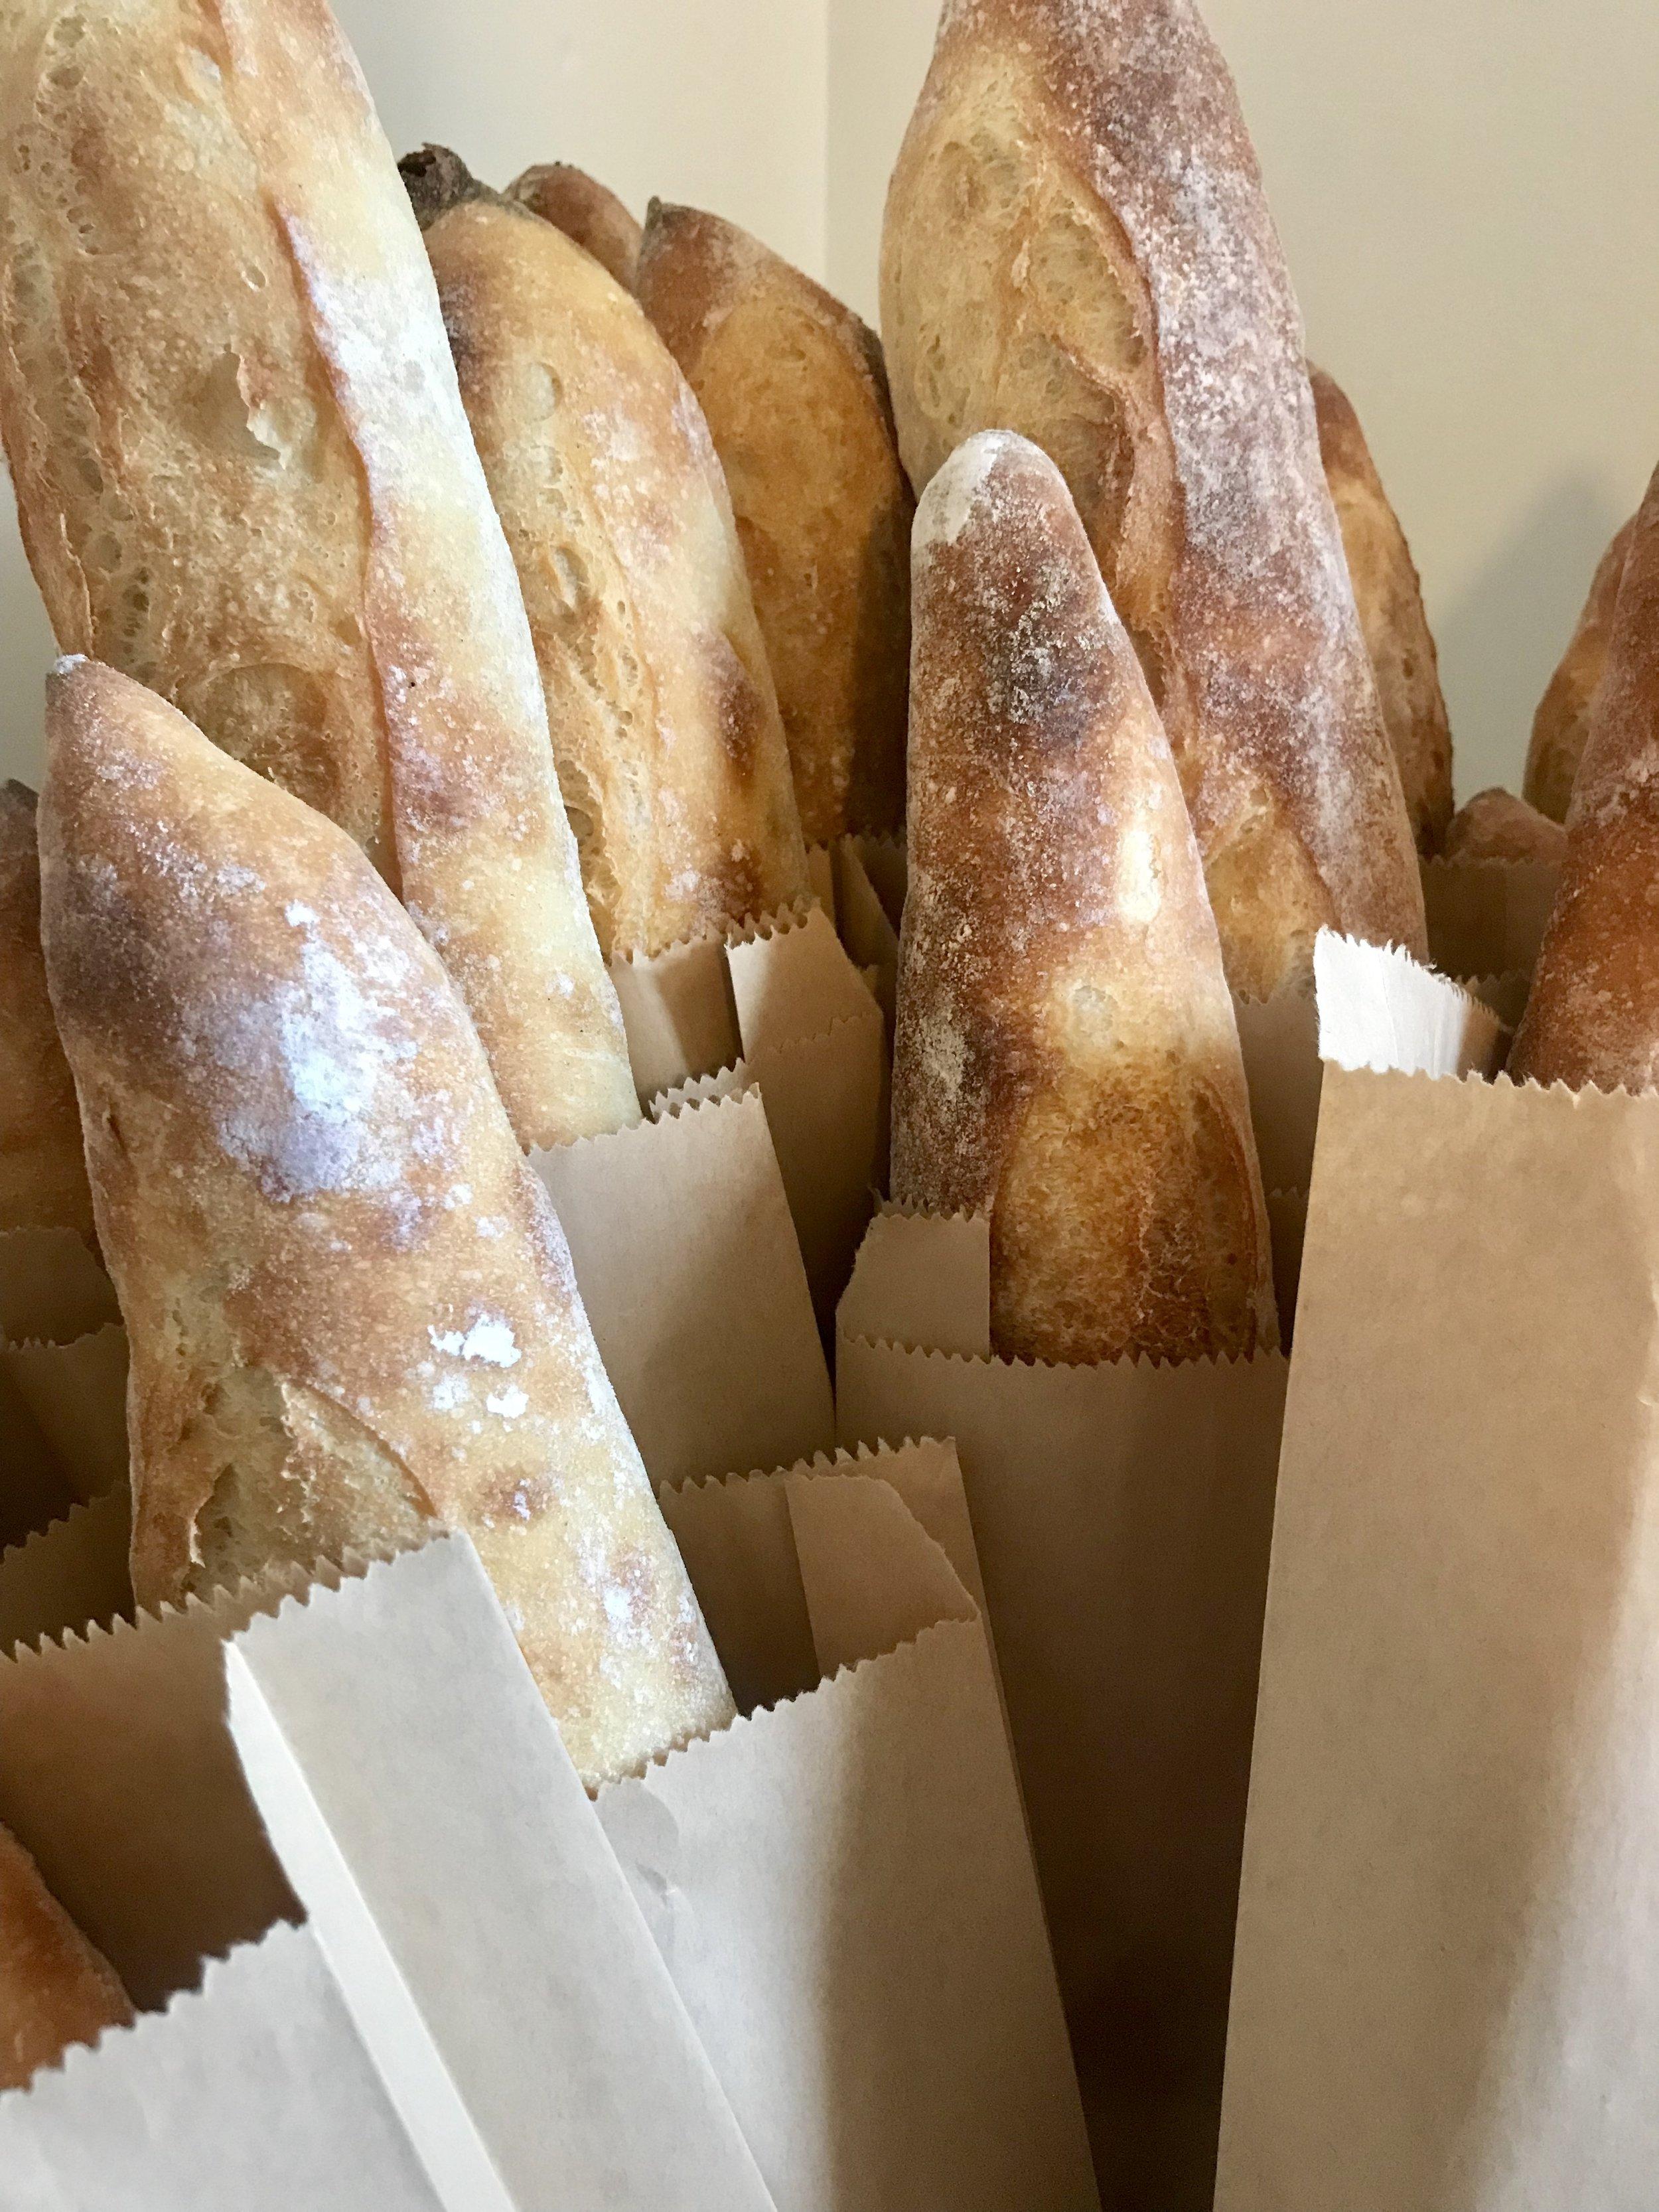 Baguette  / Hinkel's Bakery